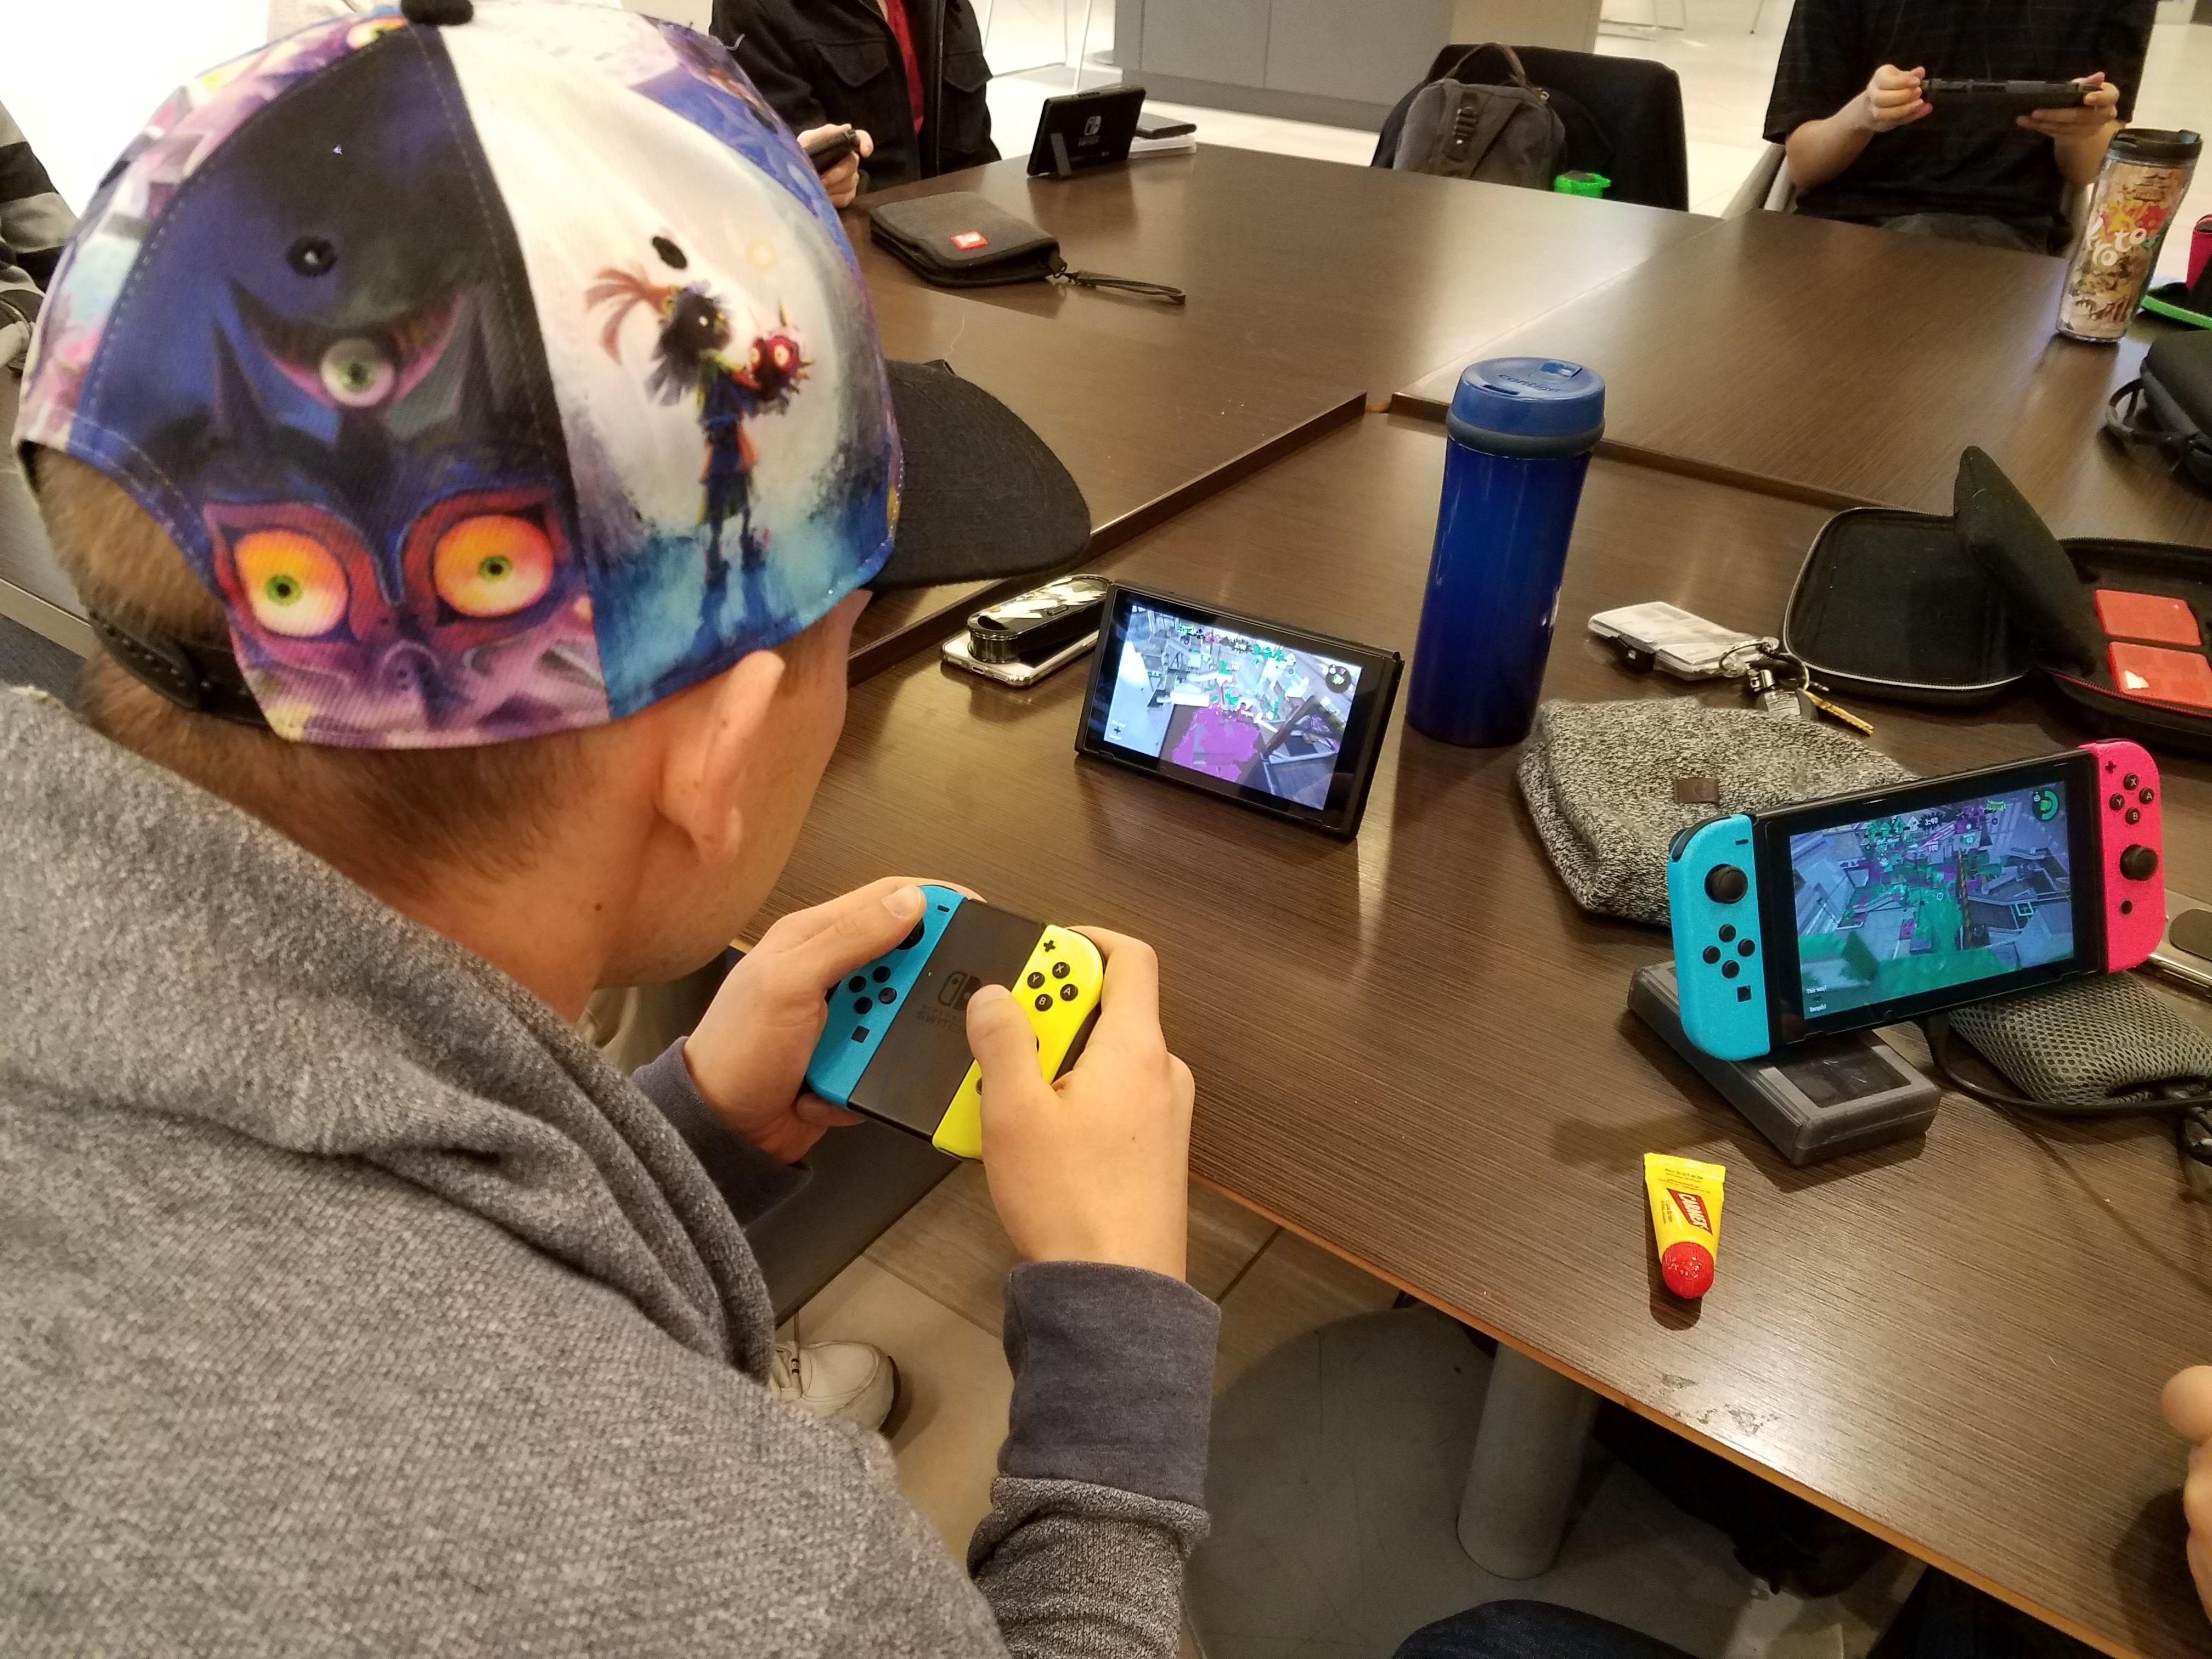 DMV Nintendo Switch Local Gaming Group